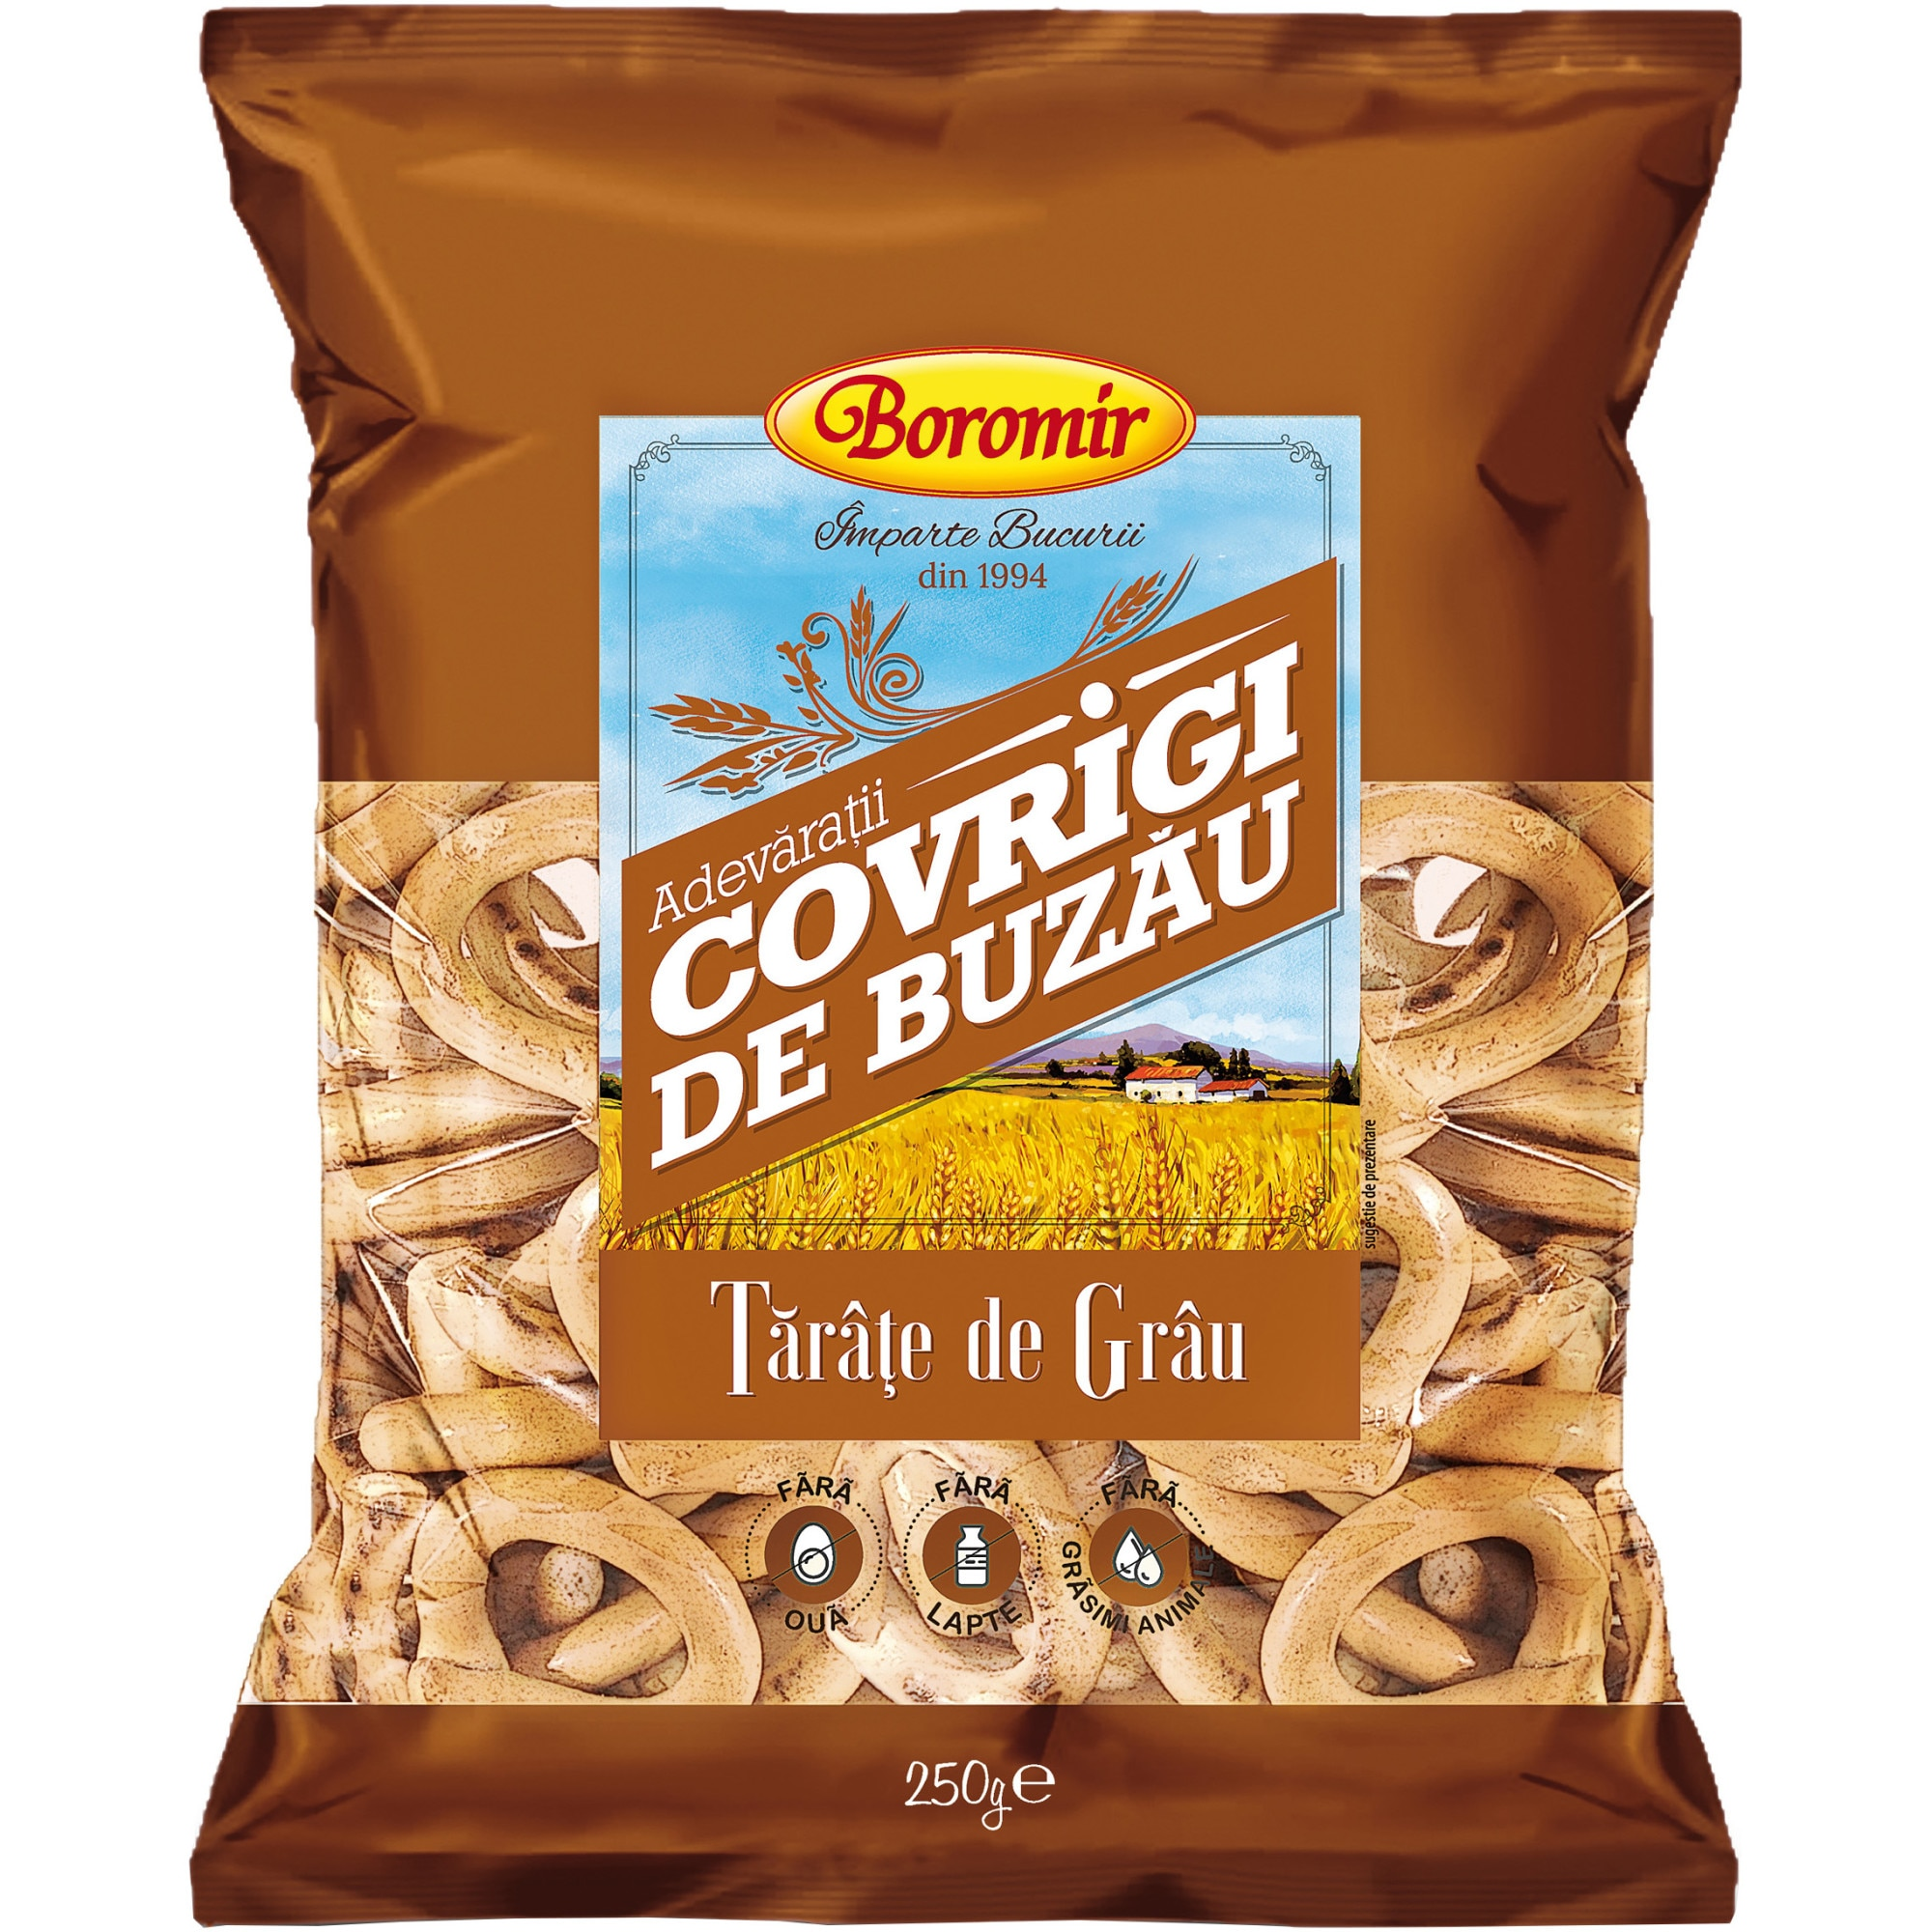 Covrigi de Buzau Boromir, cu tarate, 250g - eMAG.ro